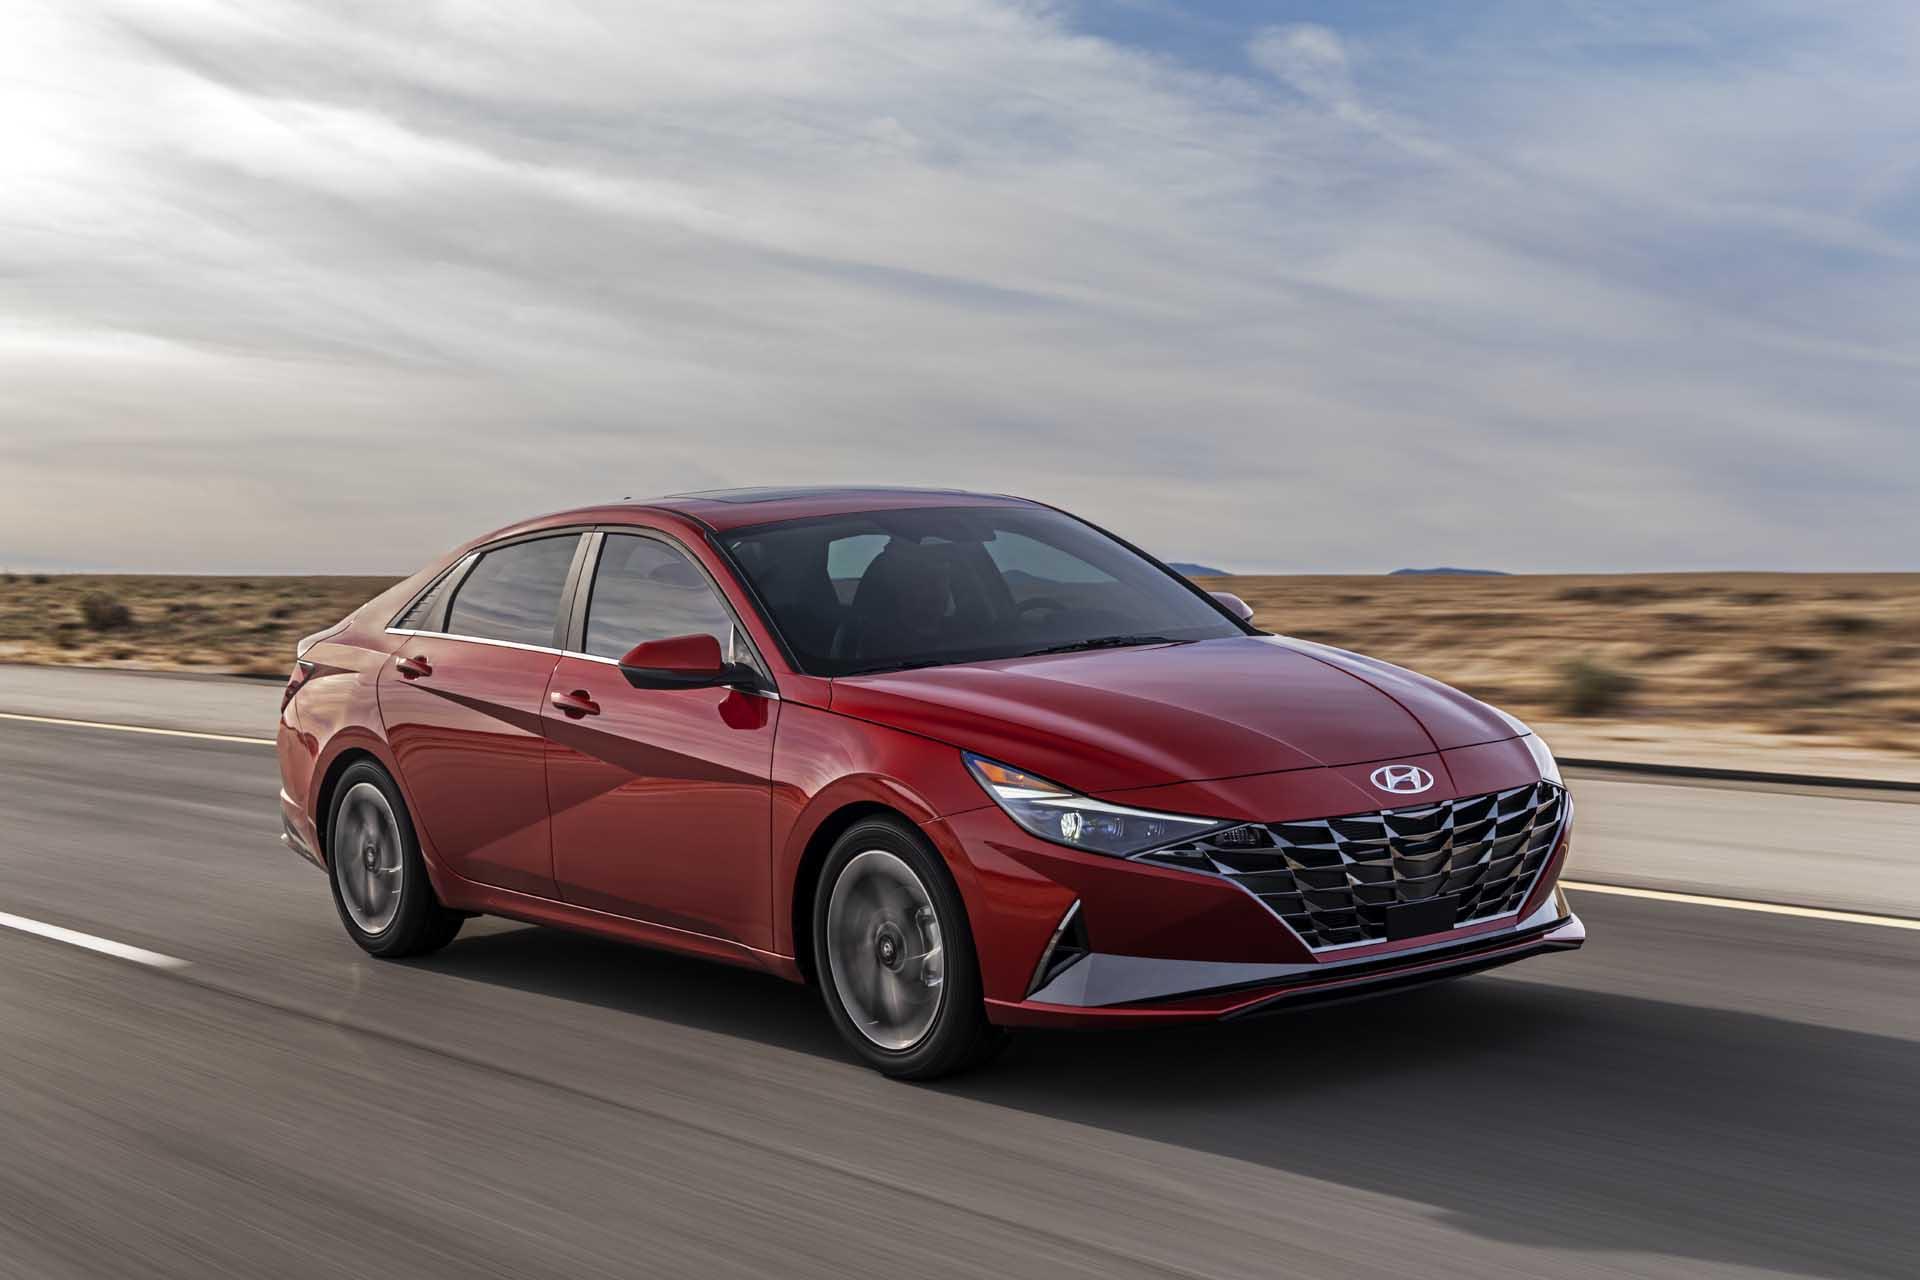 2021 Hyundai Sonata Hybrid History